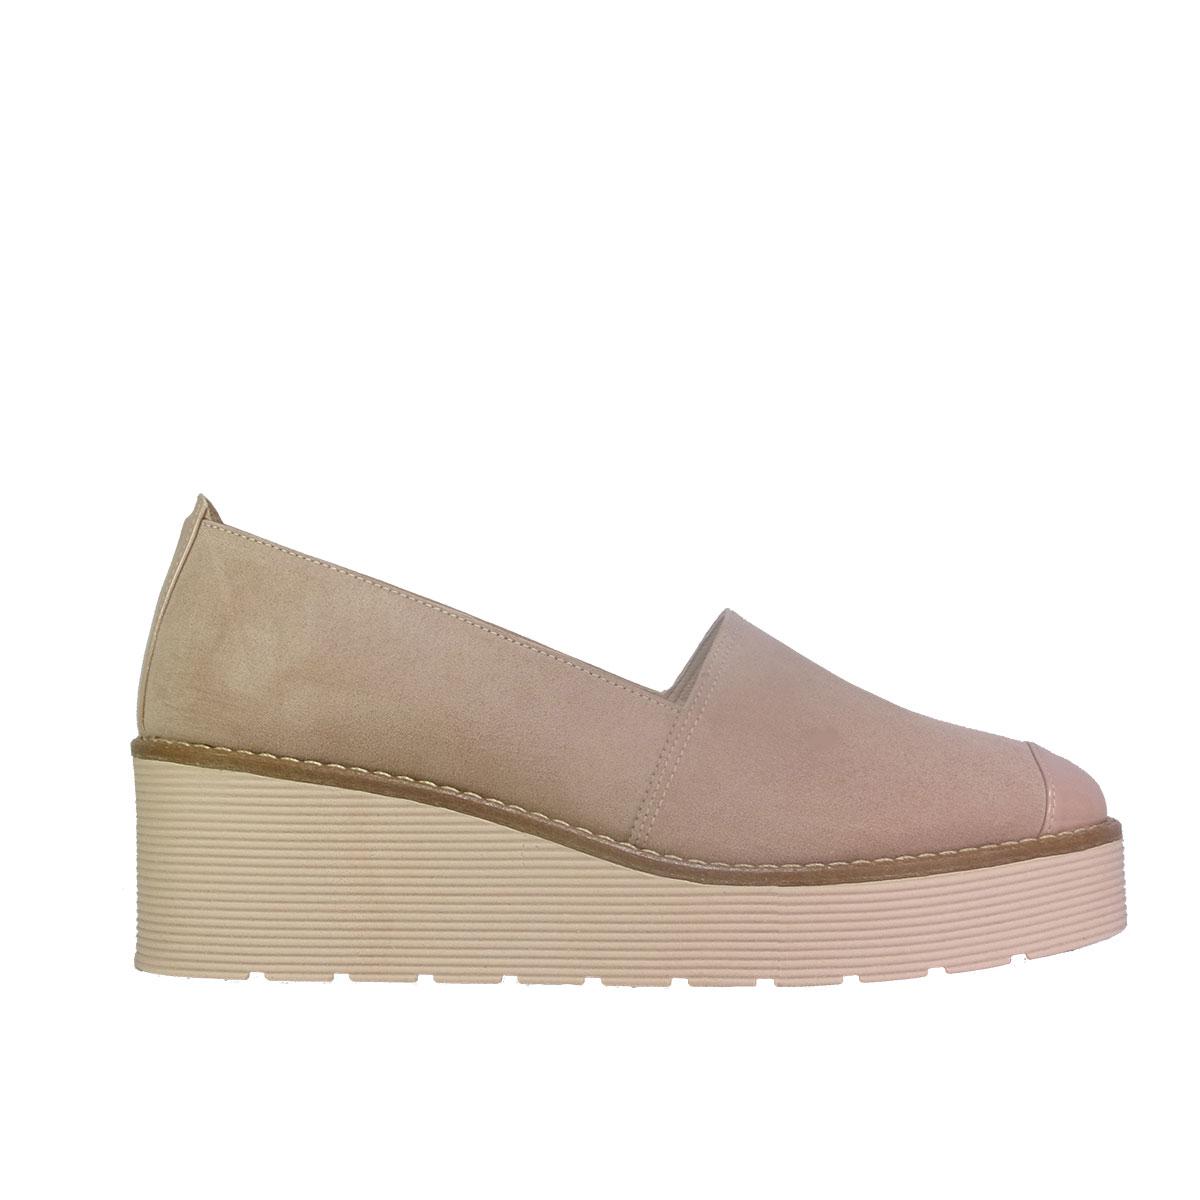 c5319140515 Beatris 310-EL Γυναικεία Παπούτσια Loafers Nude Suede